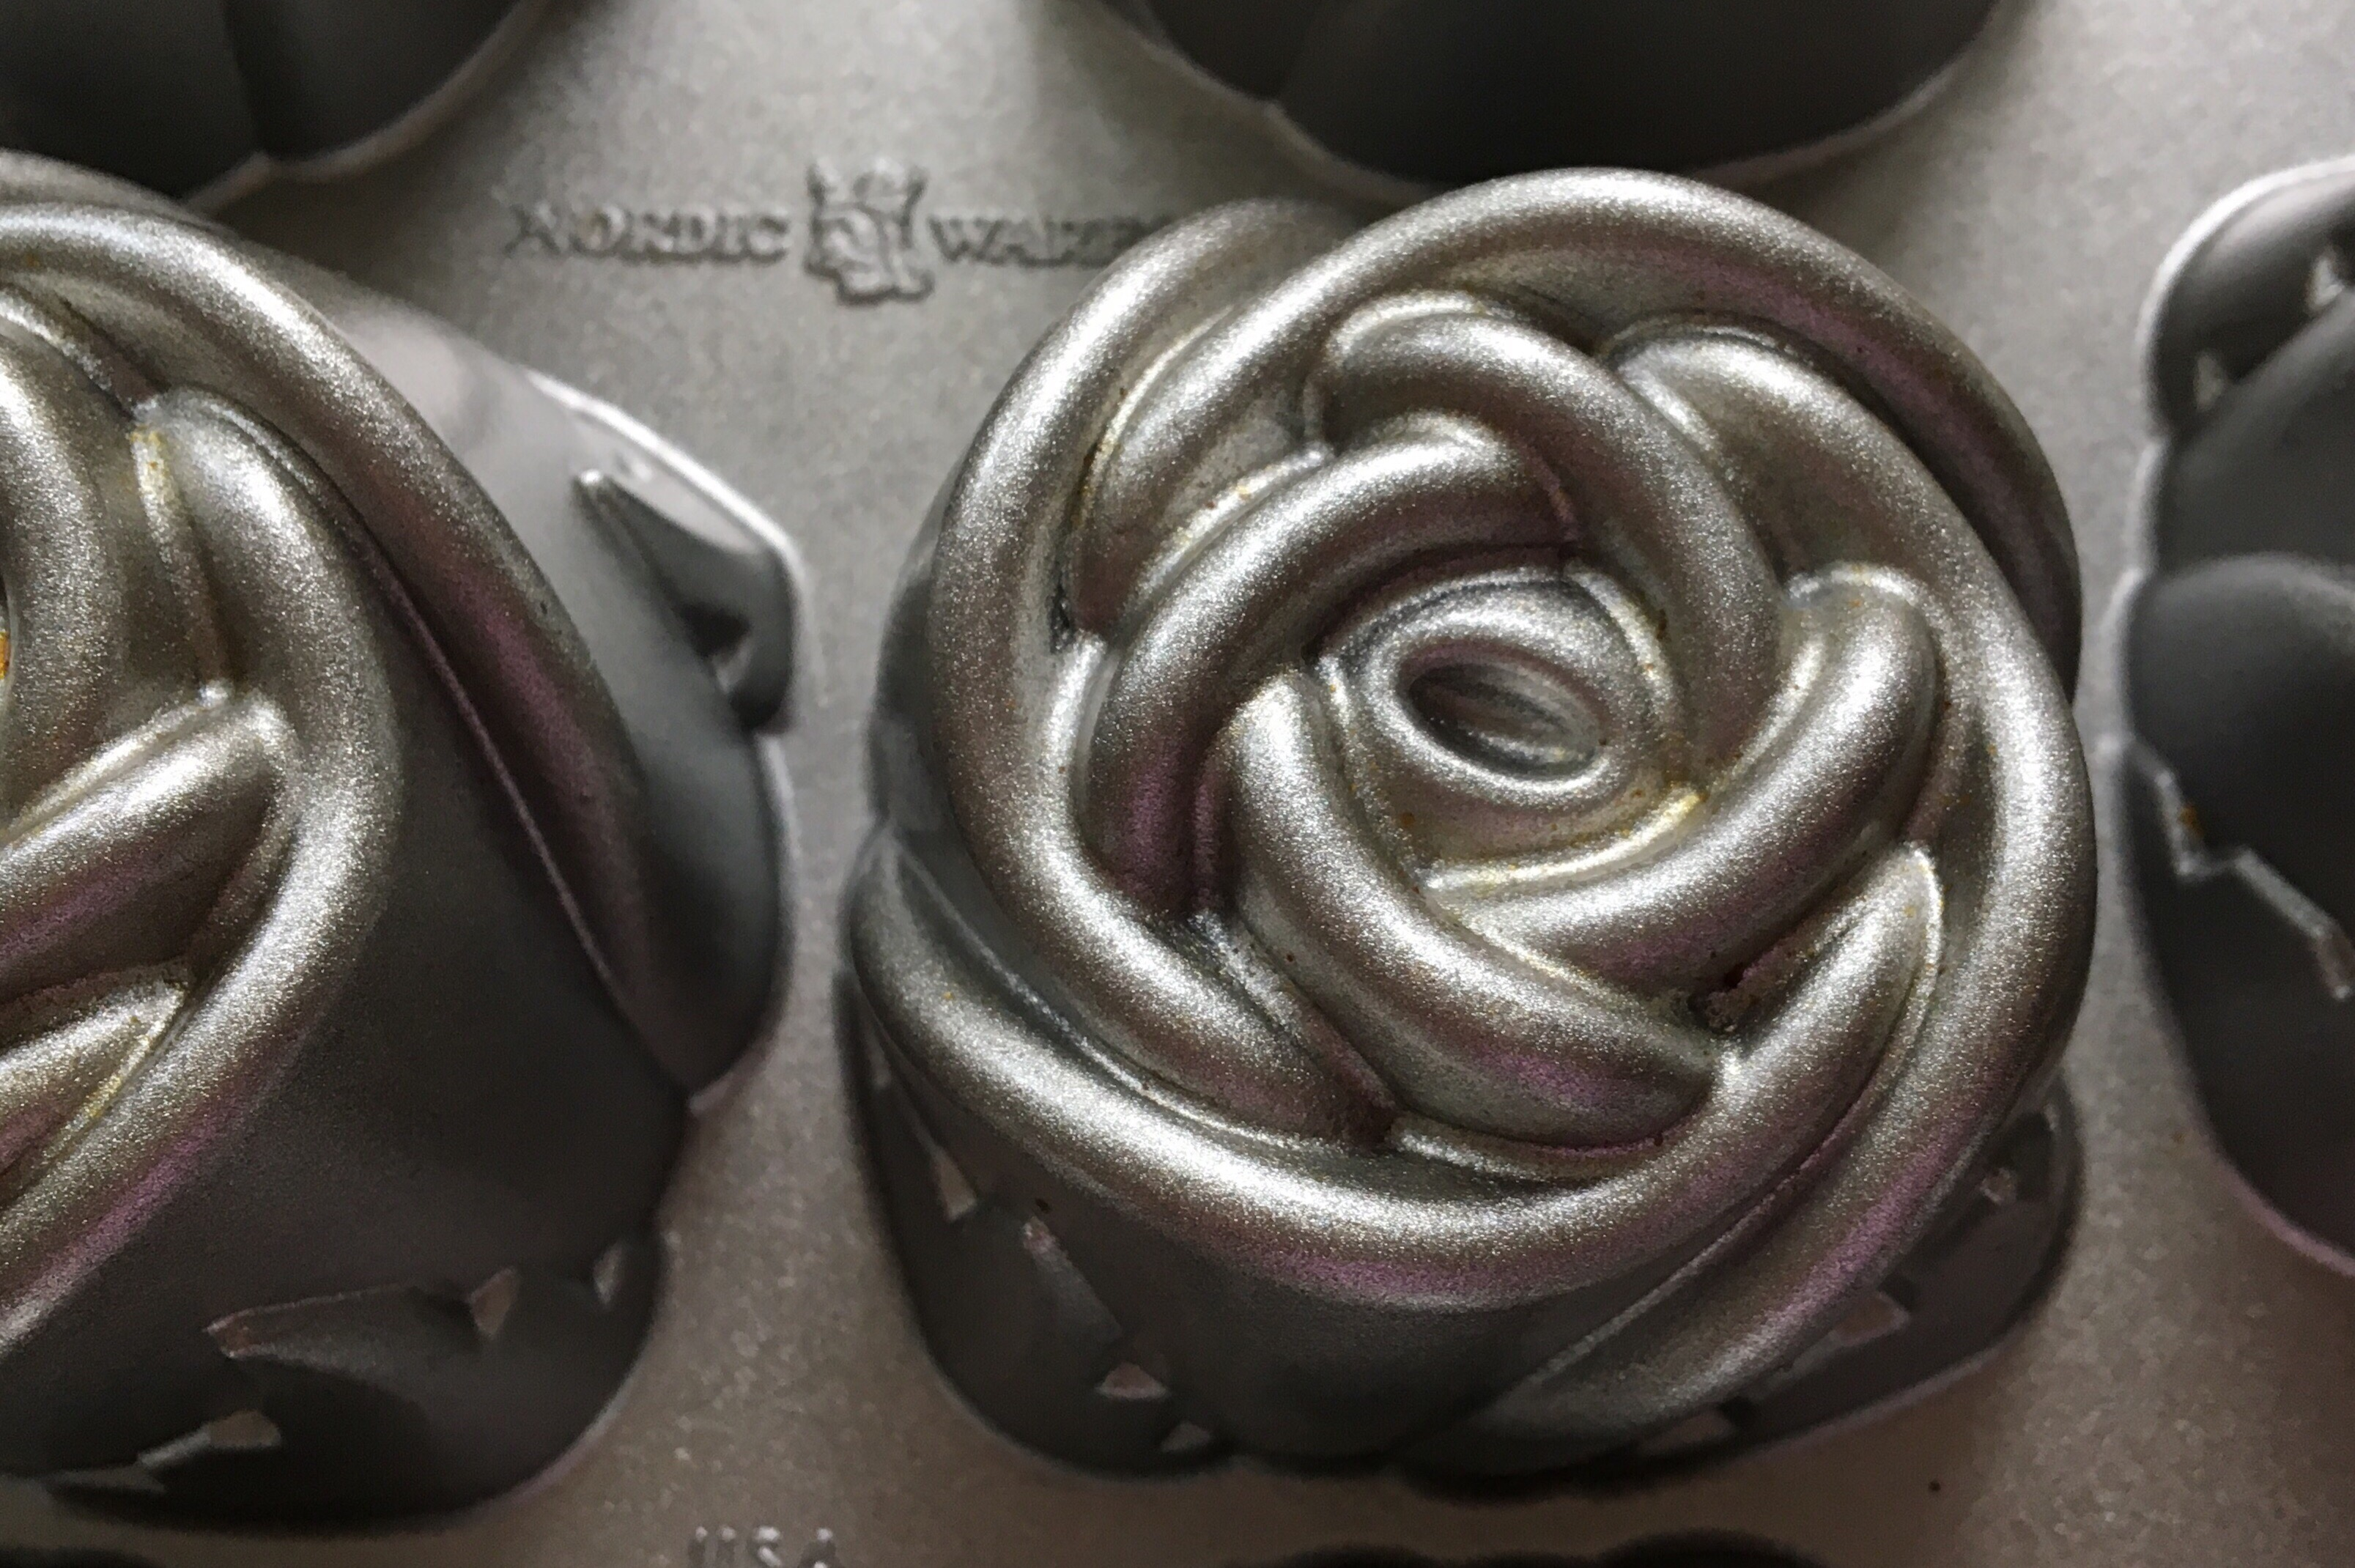 Nordic Ware Sweetheart Roses bageform